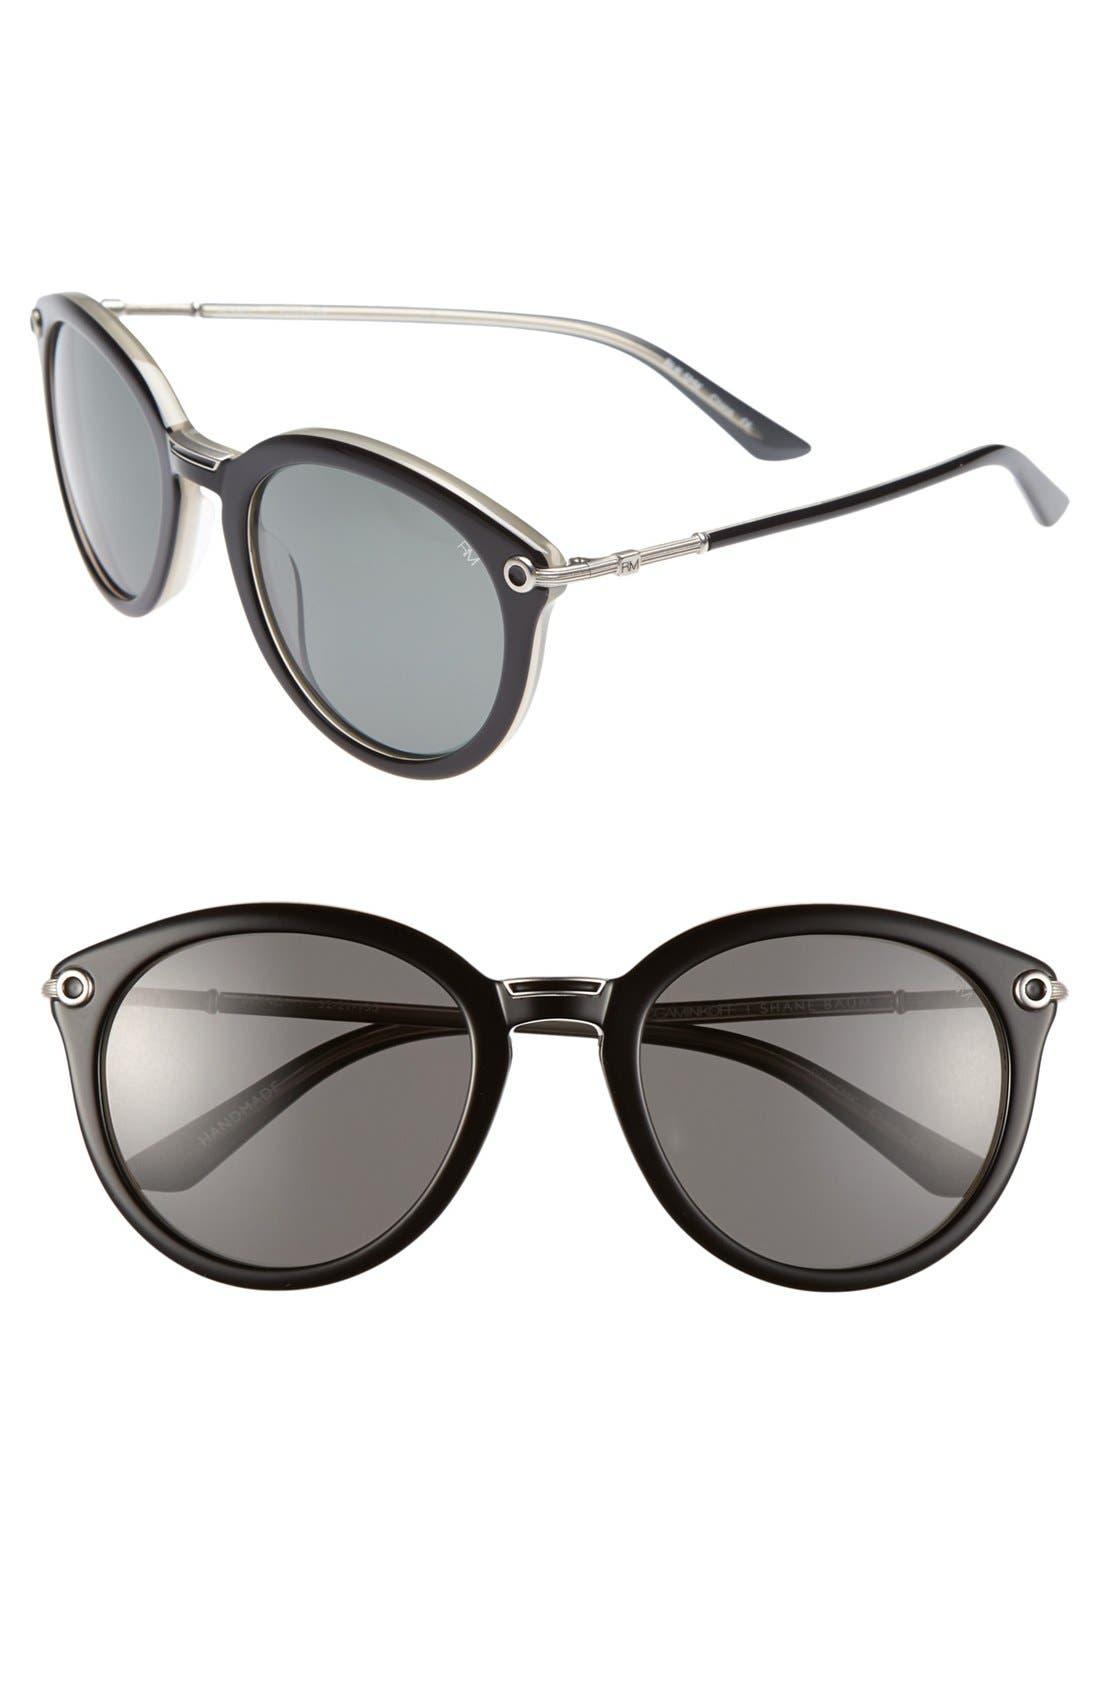 Alternate Image 1 Selected - Rebecca Minkoff 'Bond' 52mm Sunglasses